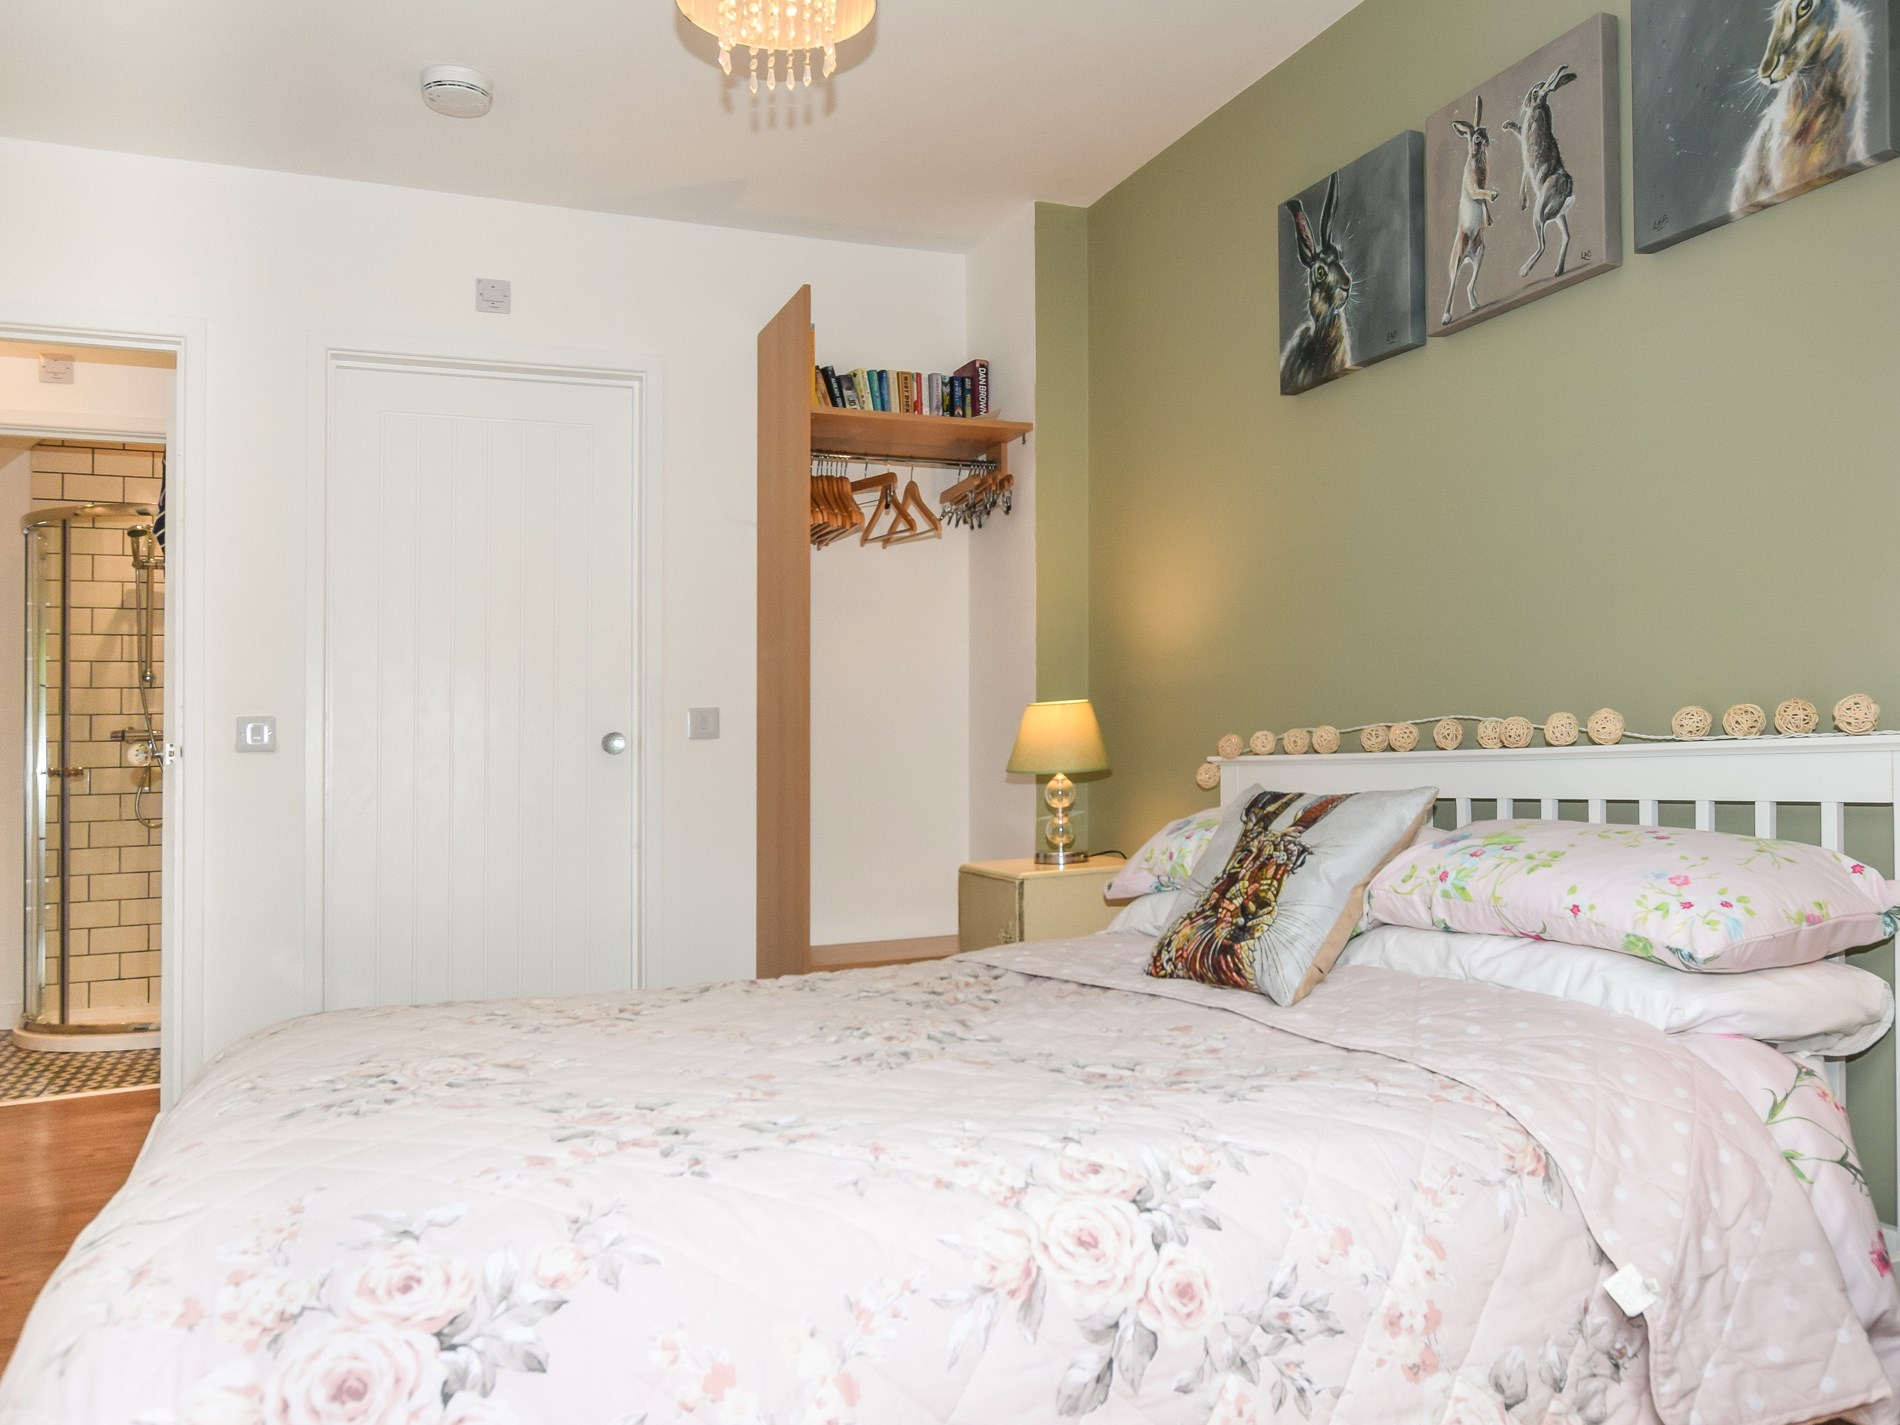 2 Bedroom Log Cabin in Worcestershire, Heart of England